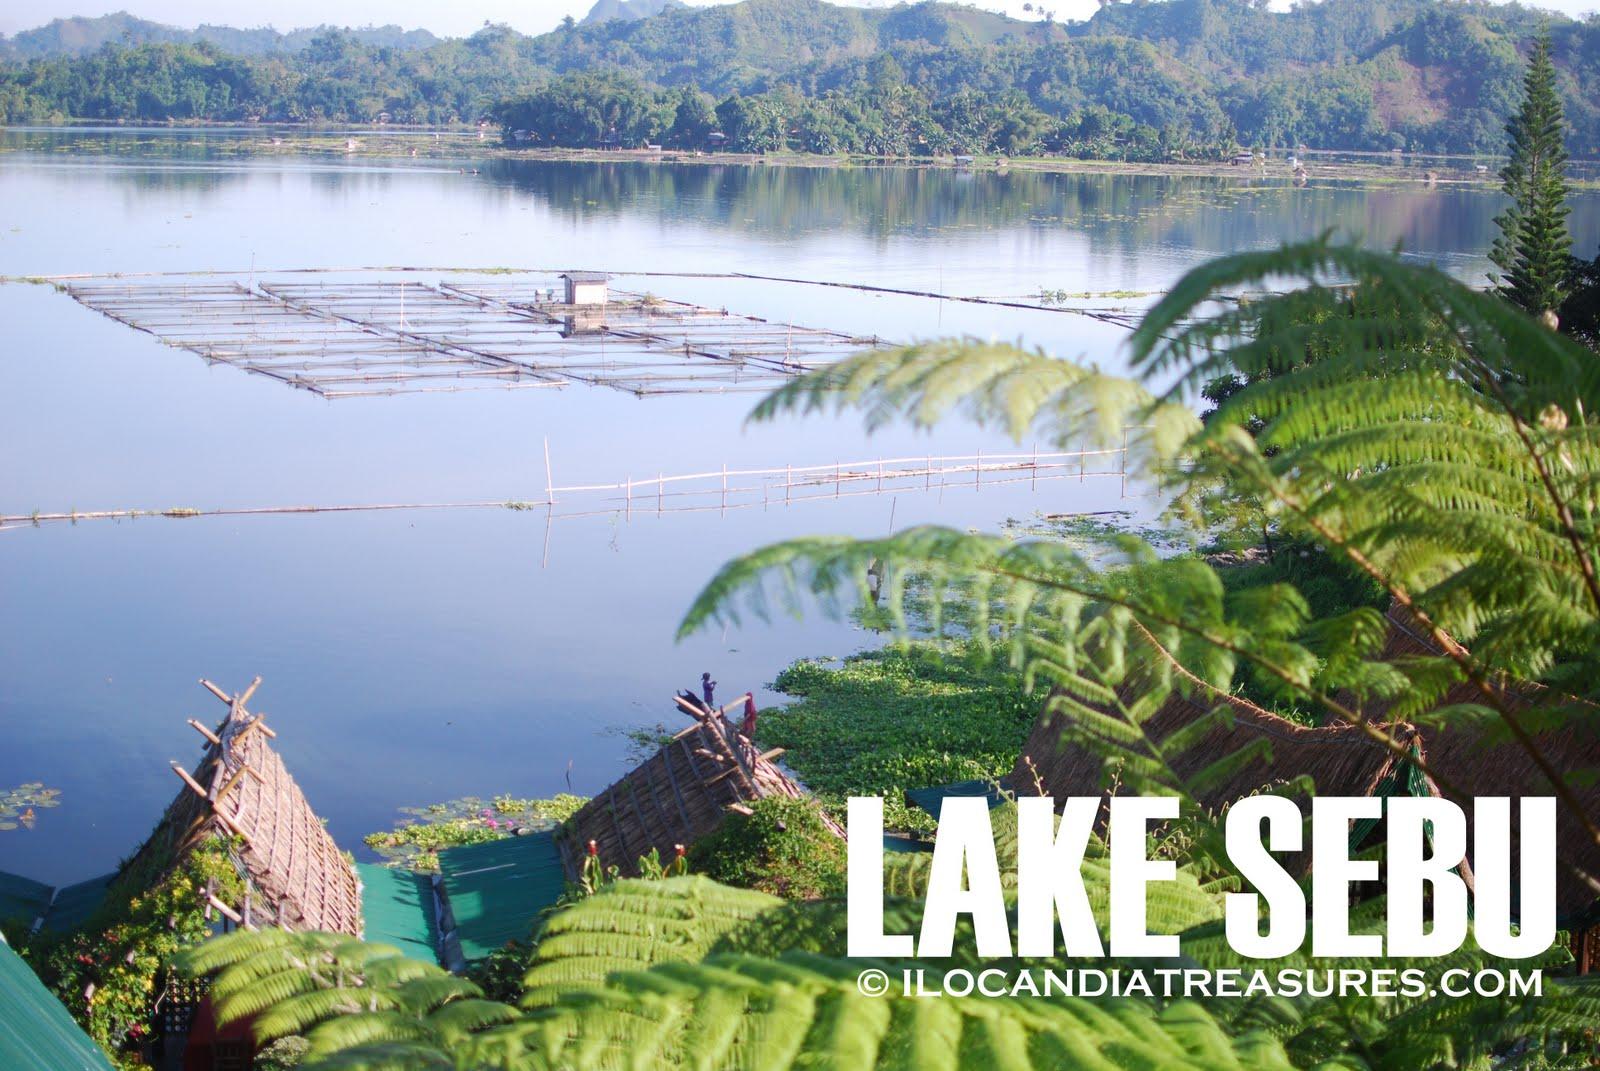 Treasures of ilocandia and the world quaintly lake sebu thecheapjerseys Gallery